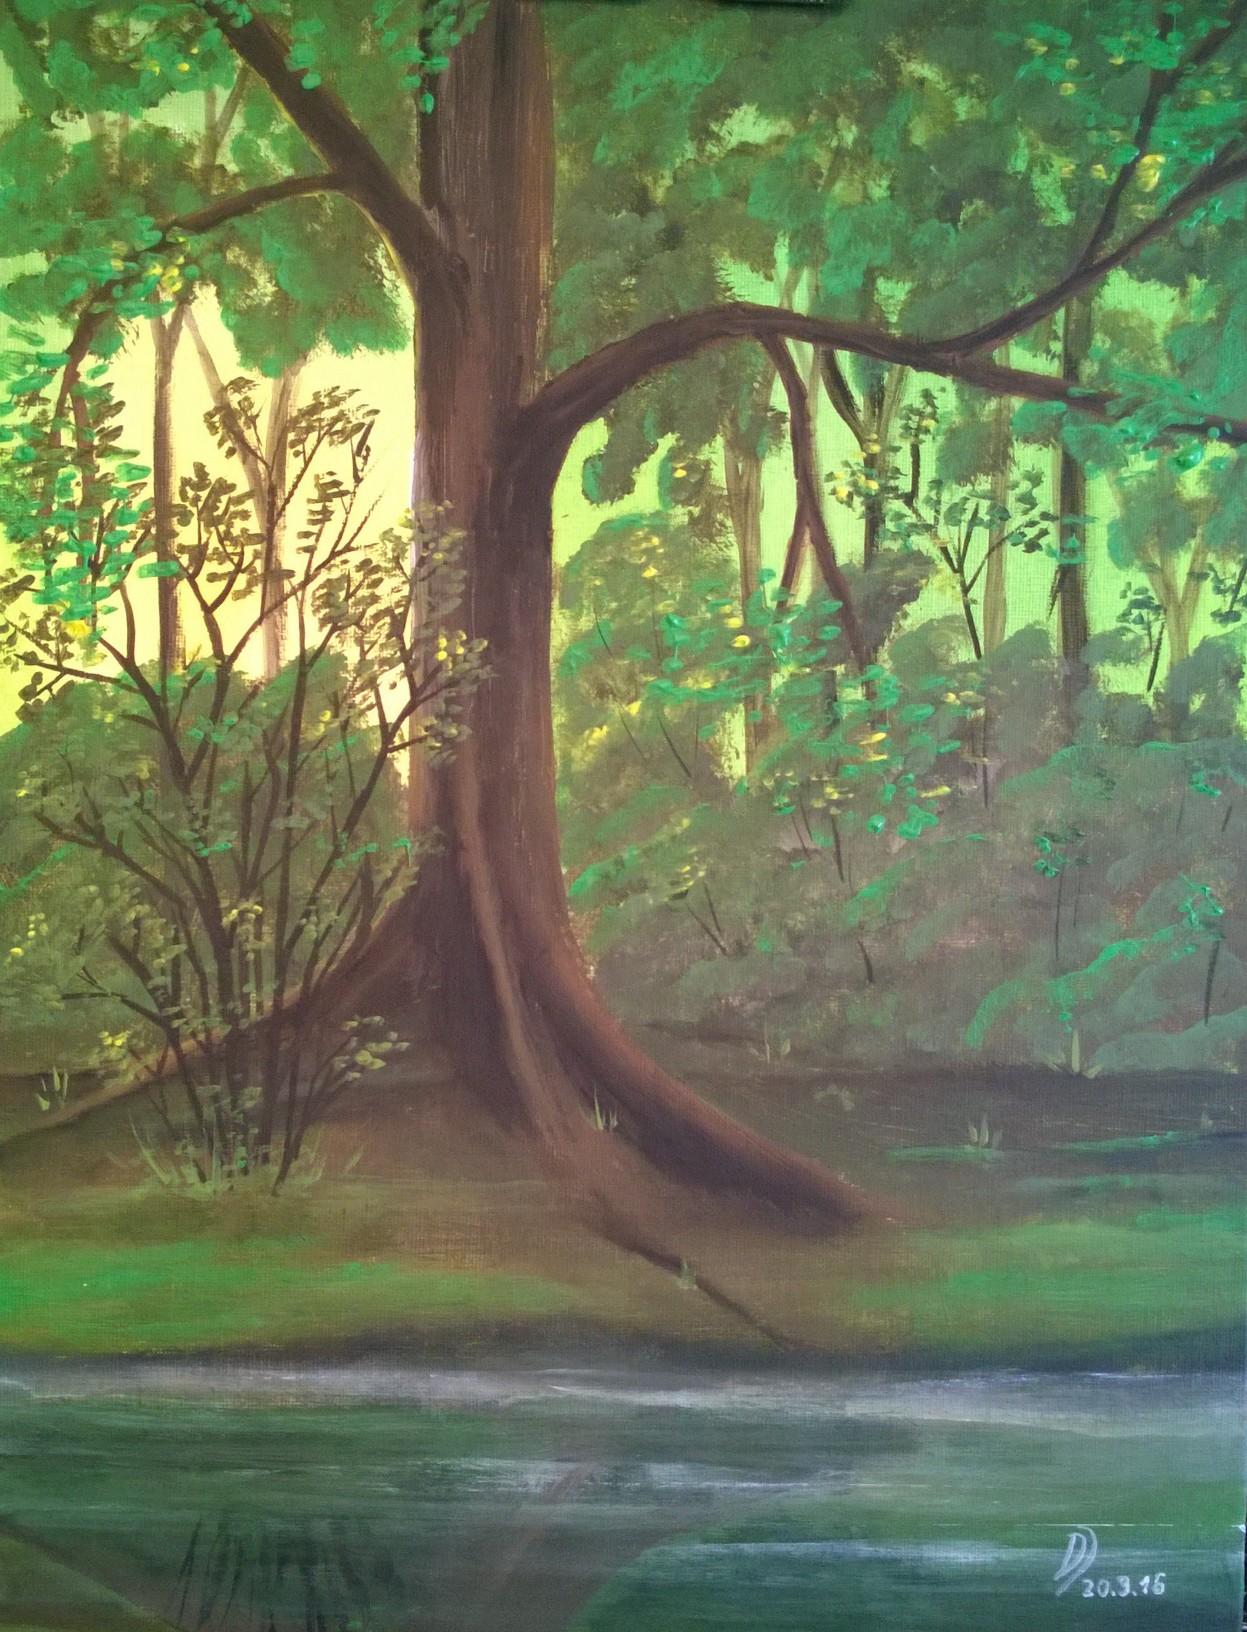 Malkurs Online Großer Baum In Morgensonne Am Waldtümpel